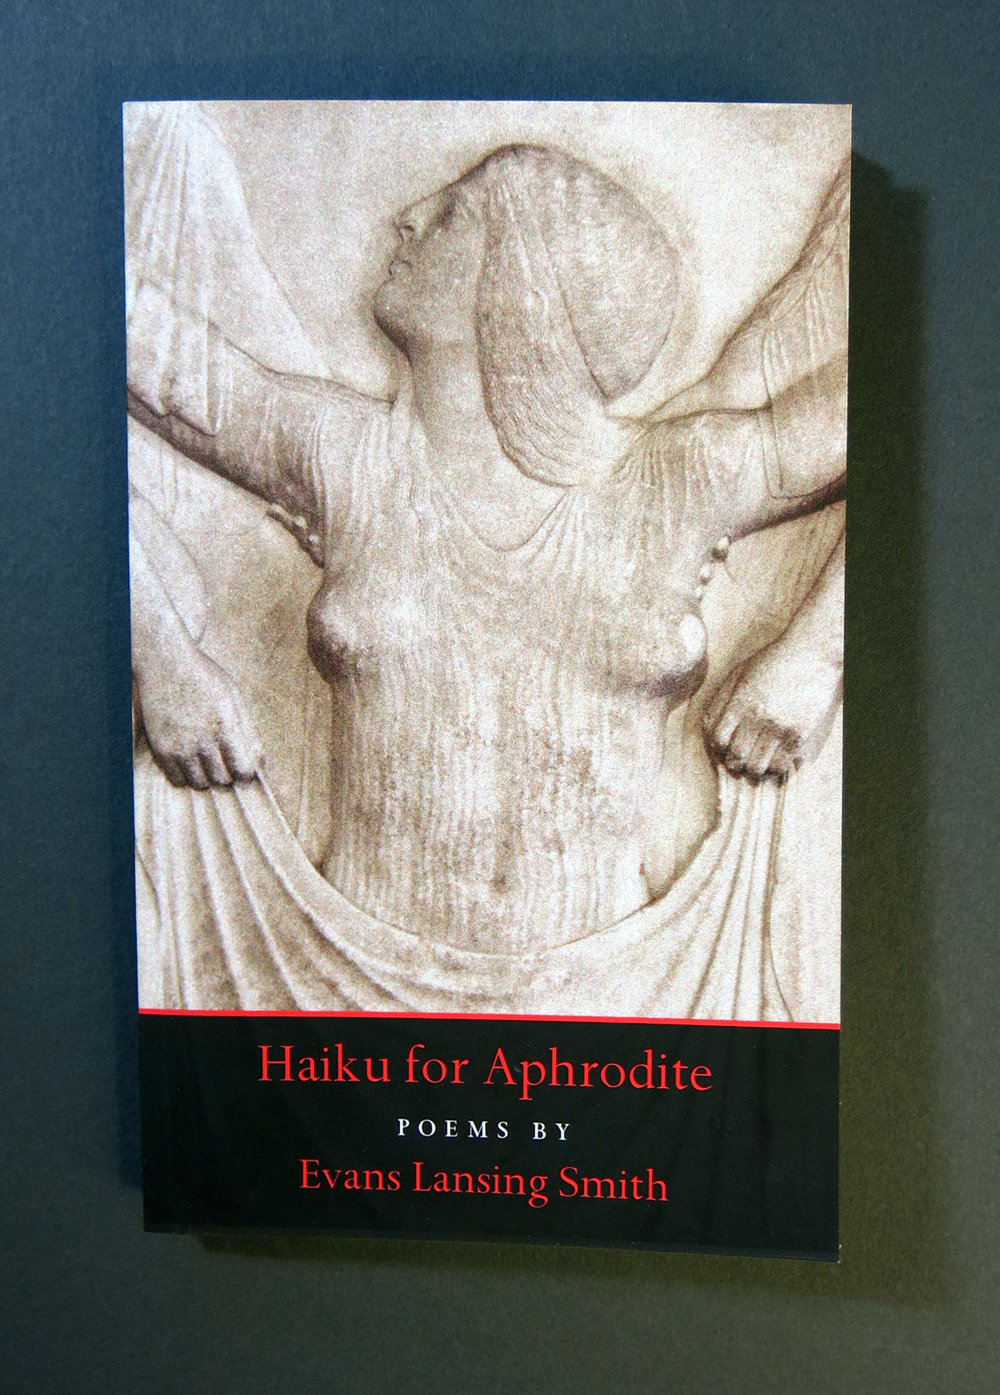 Haiku Aphrodite front cover WEB 1500 IMG_1221.jpg